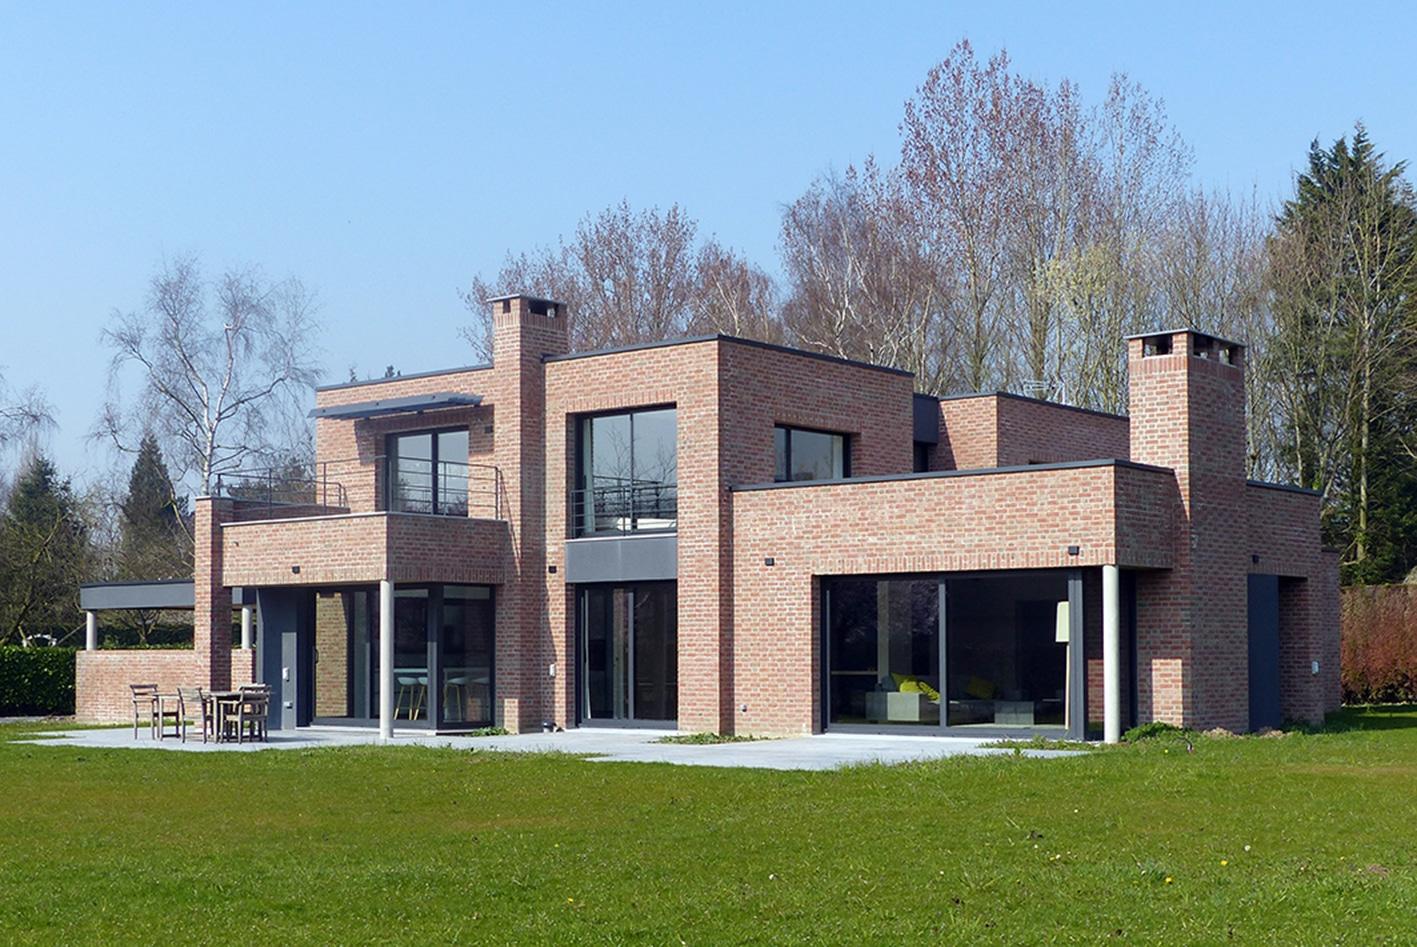 villa rouge orang e les architecteurs. Black Bedroom Furniture Sets. Home Design Ideas